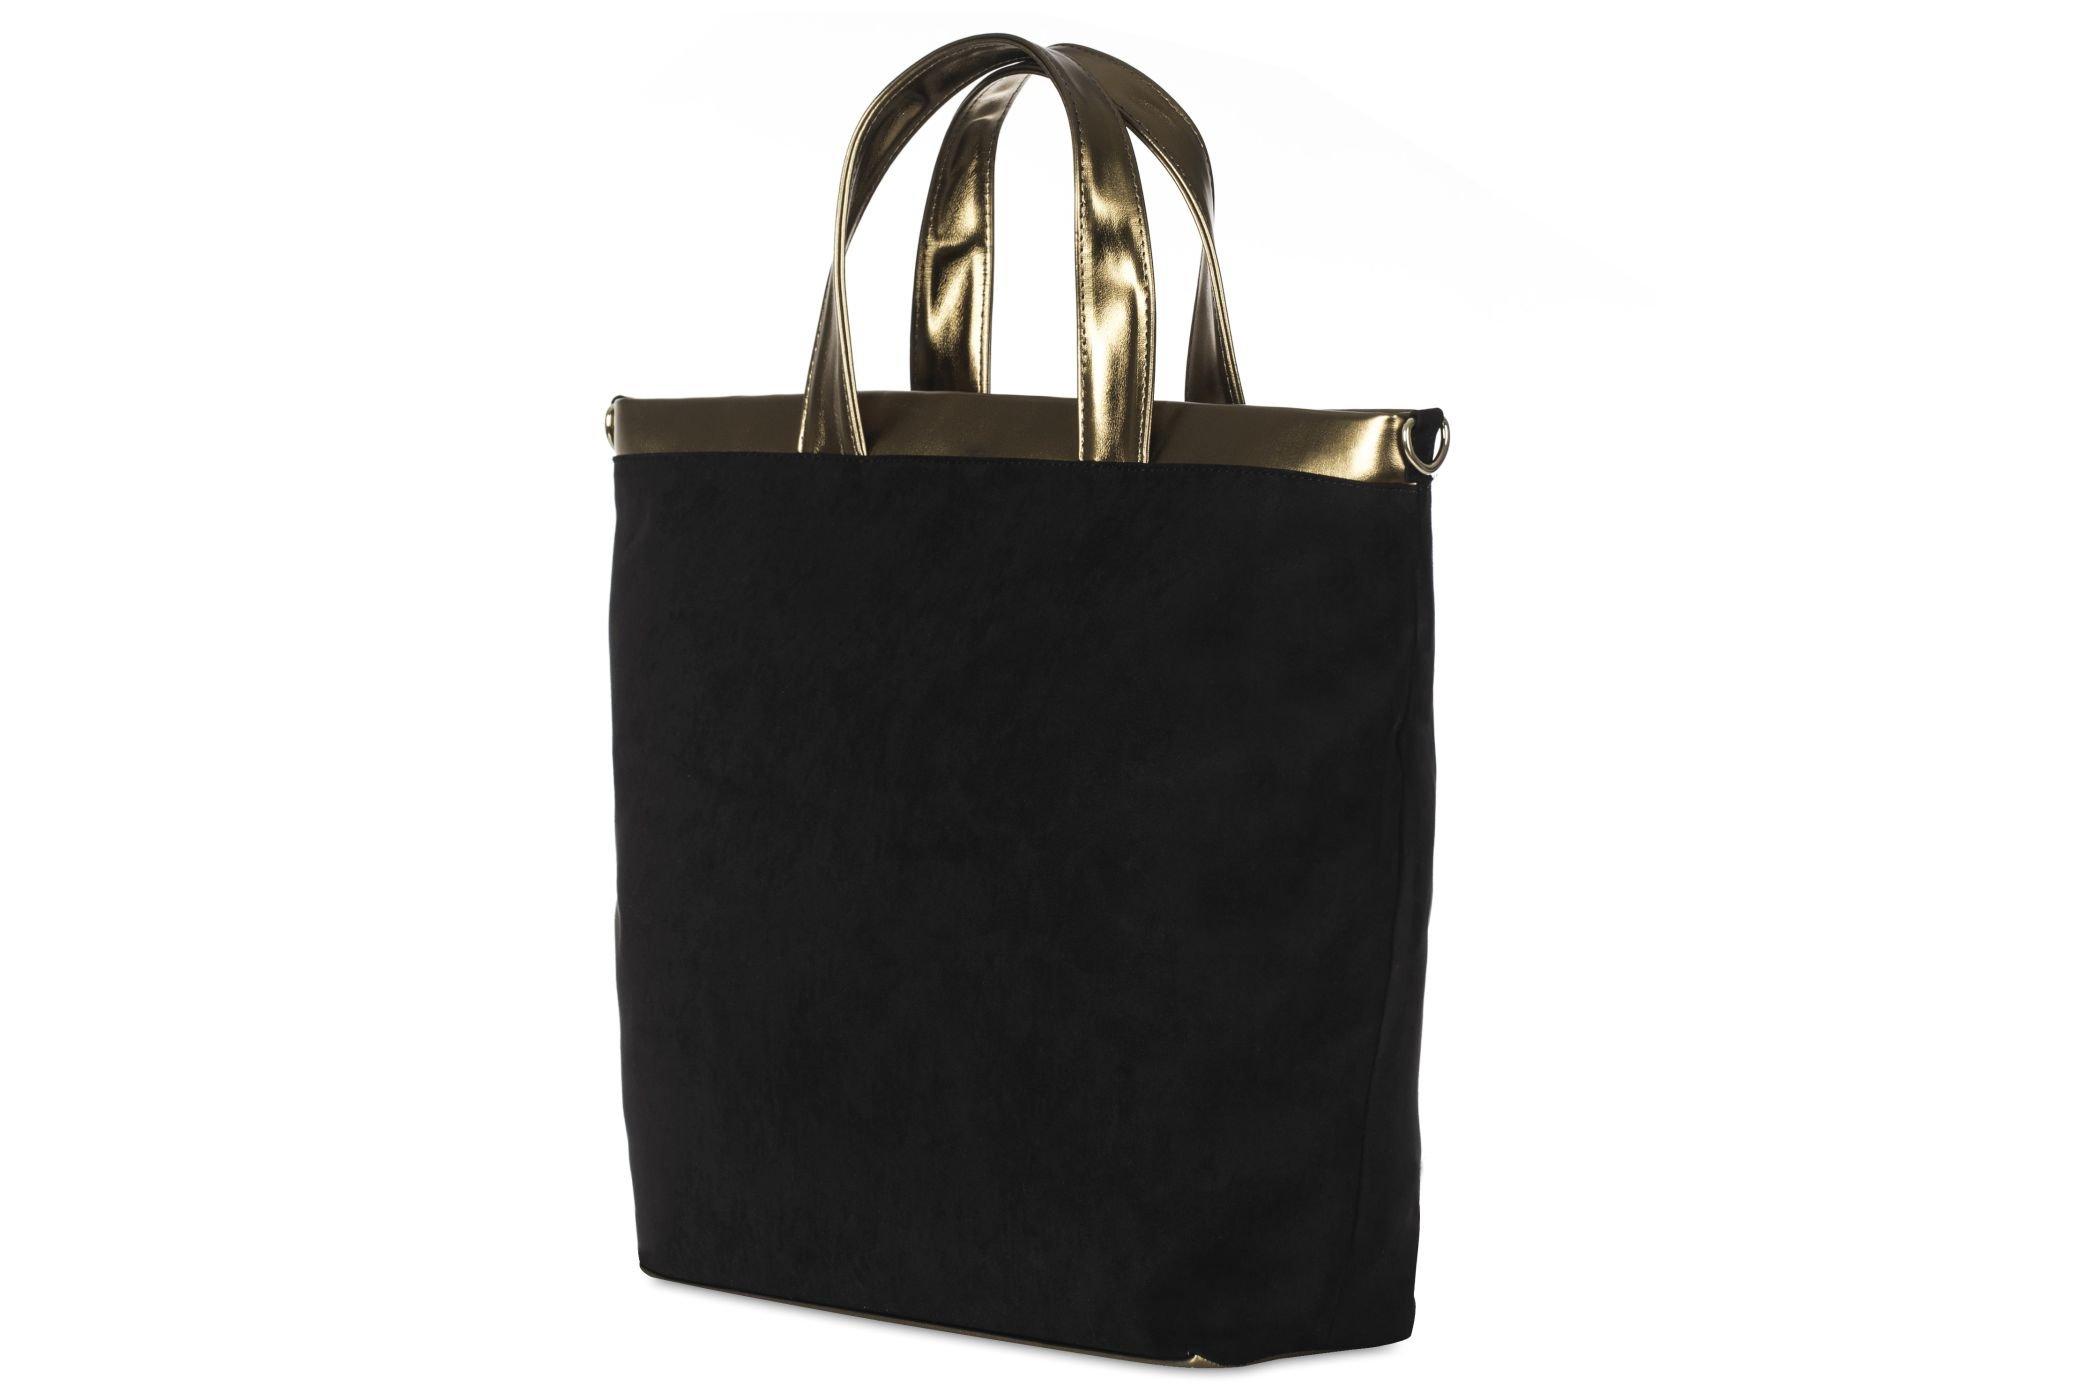 920465338da5b Miękka damska torebka miejska A4 shopper bag, cena - sklep | MB ...